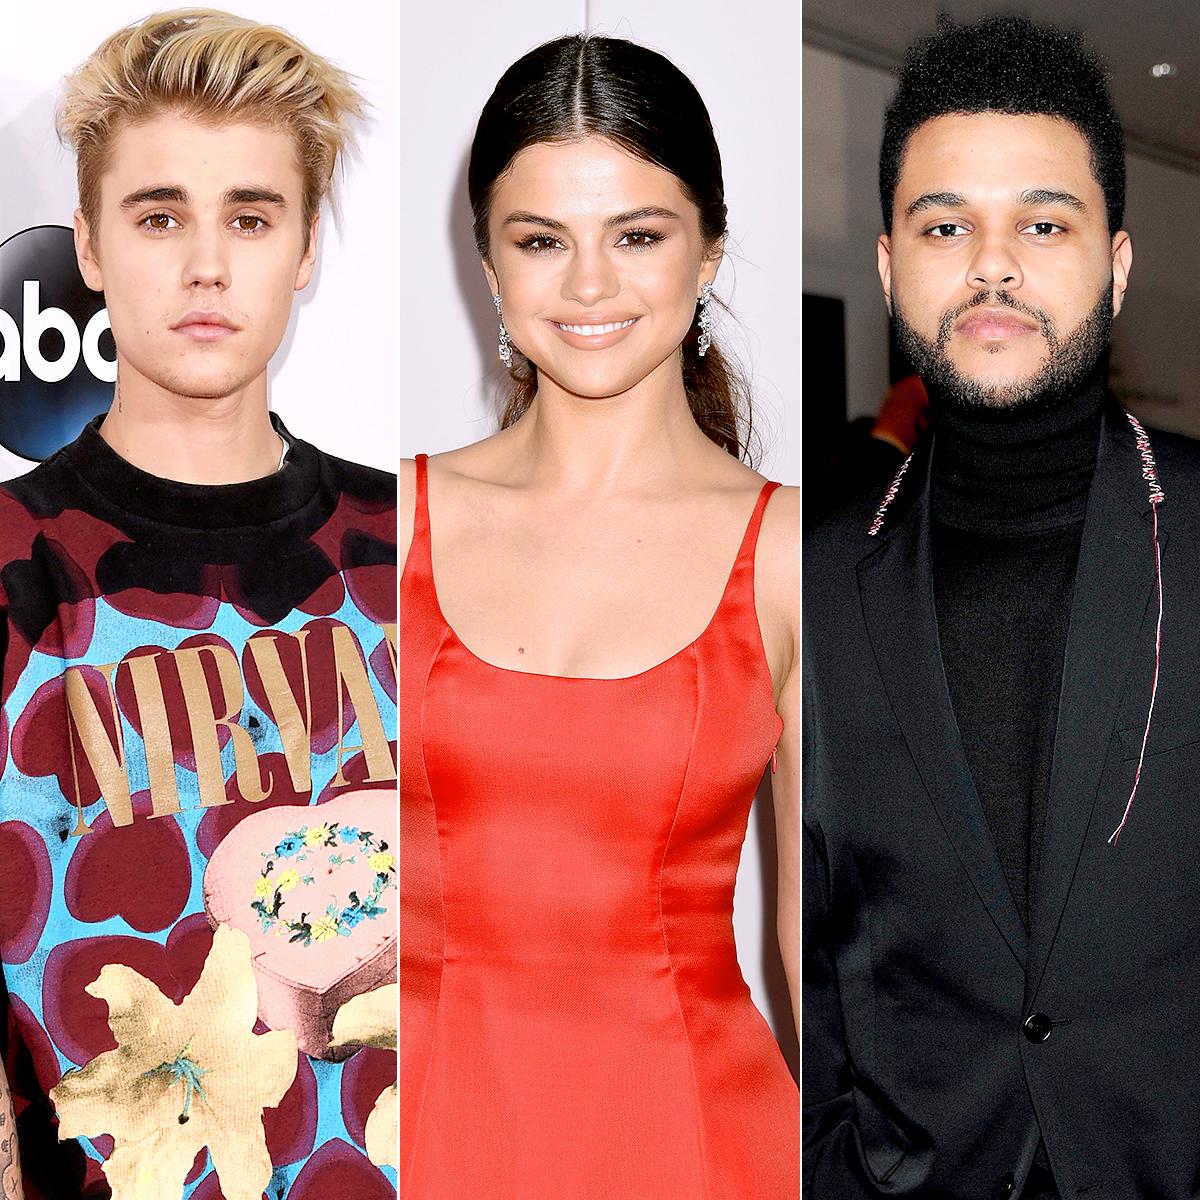 Justin Bieber, Selena Gomez, and The Weeknd